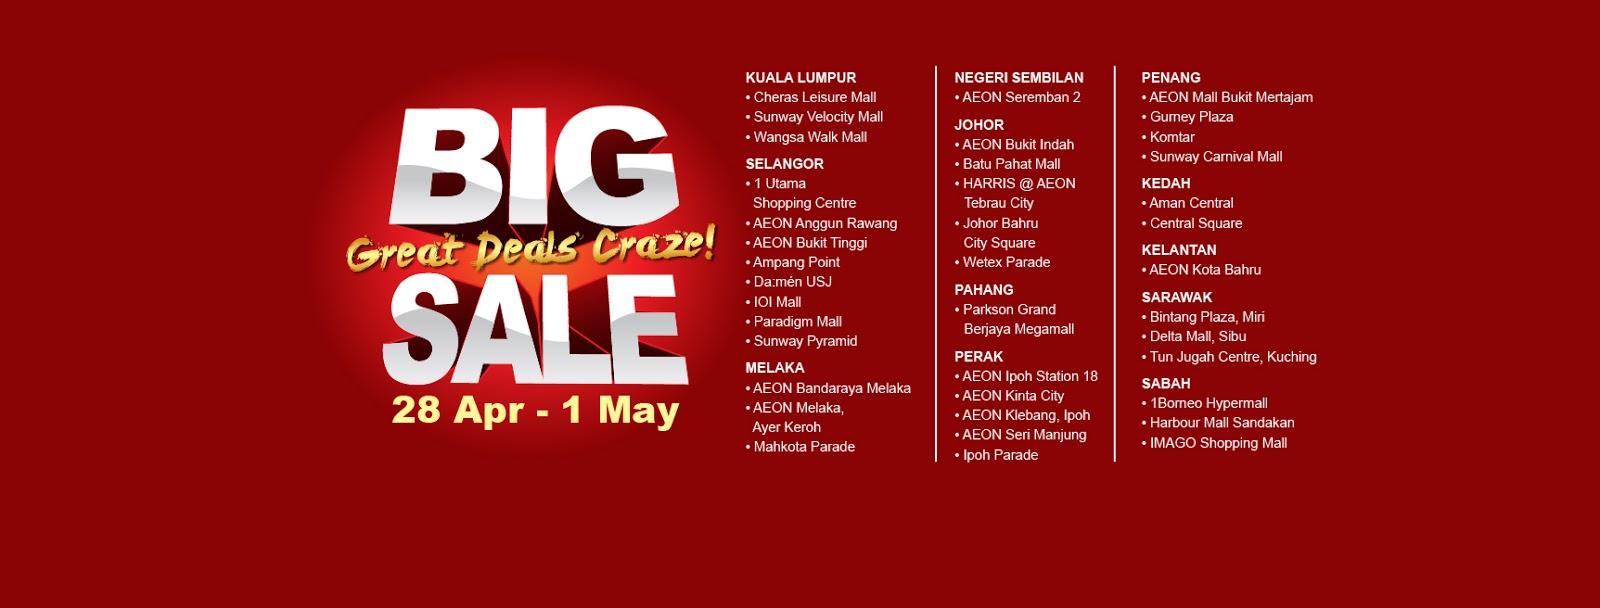 Popular Bookstore Big Sale Member Storewide 20 Discount Extra 5